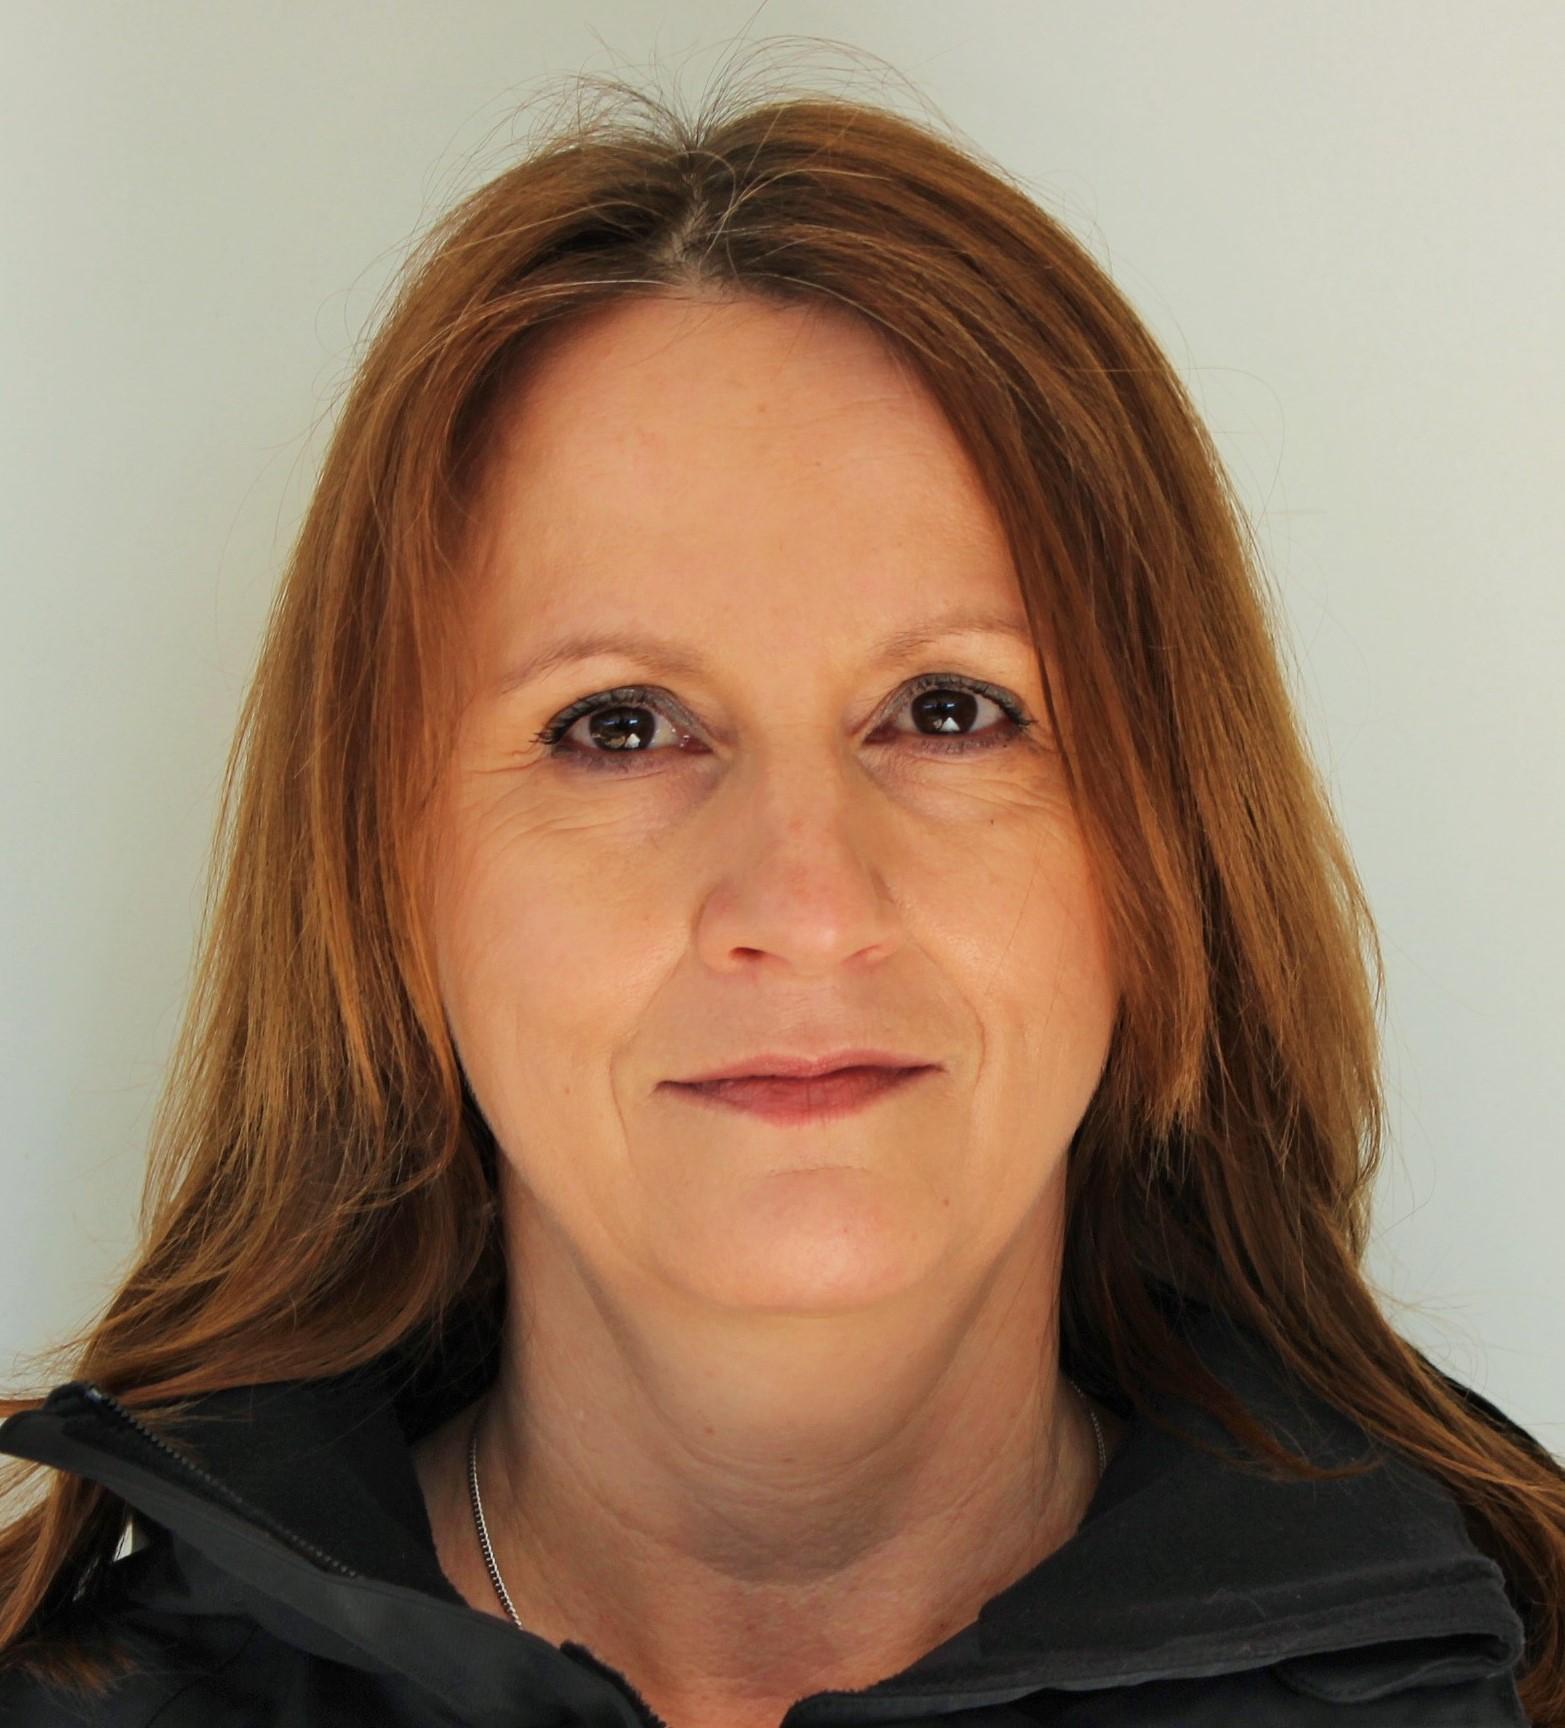 Corina Kalt